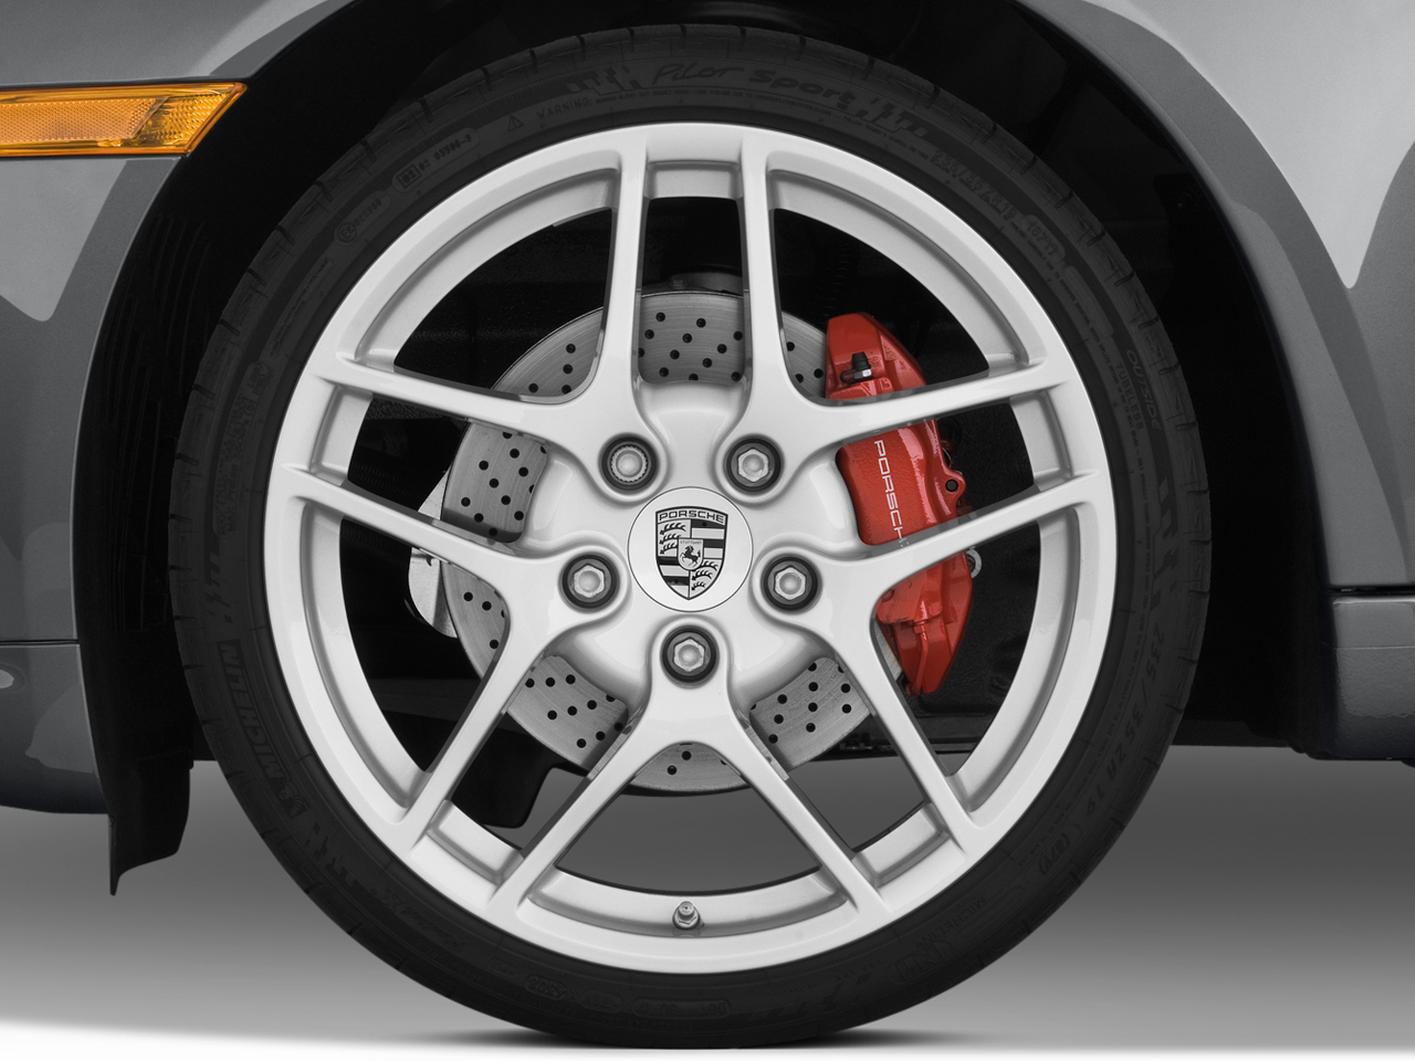 2009 Porsche News & Reviews | Automobile